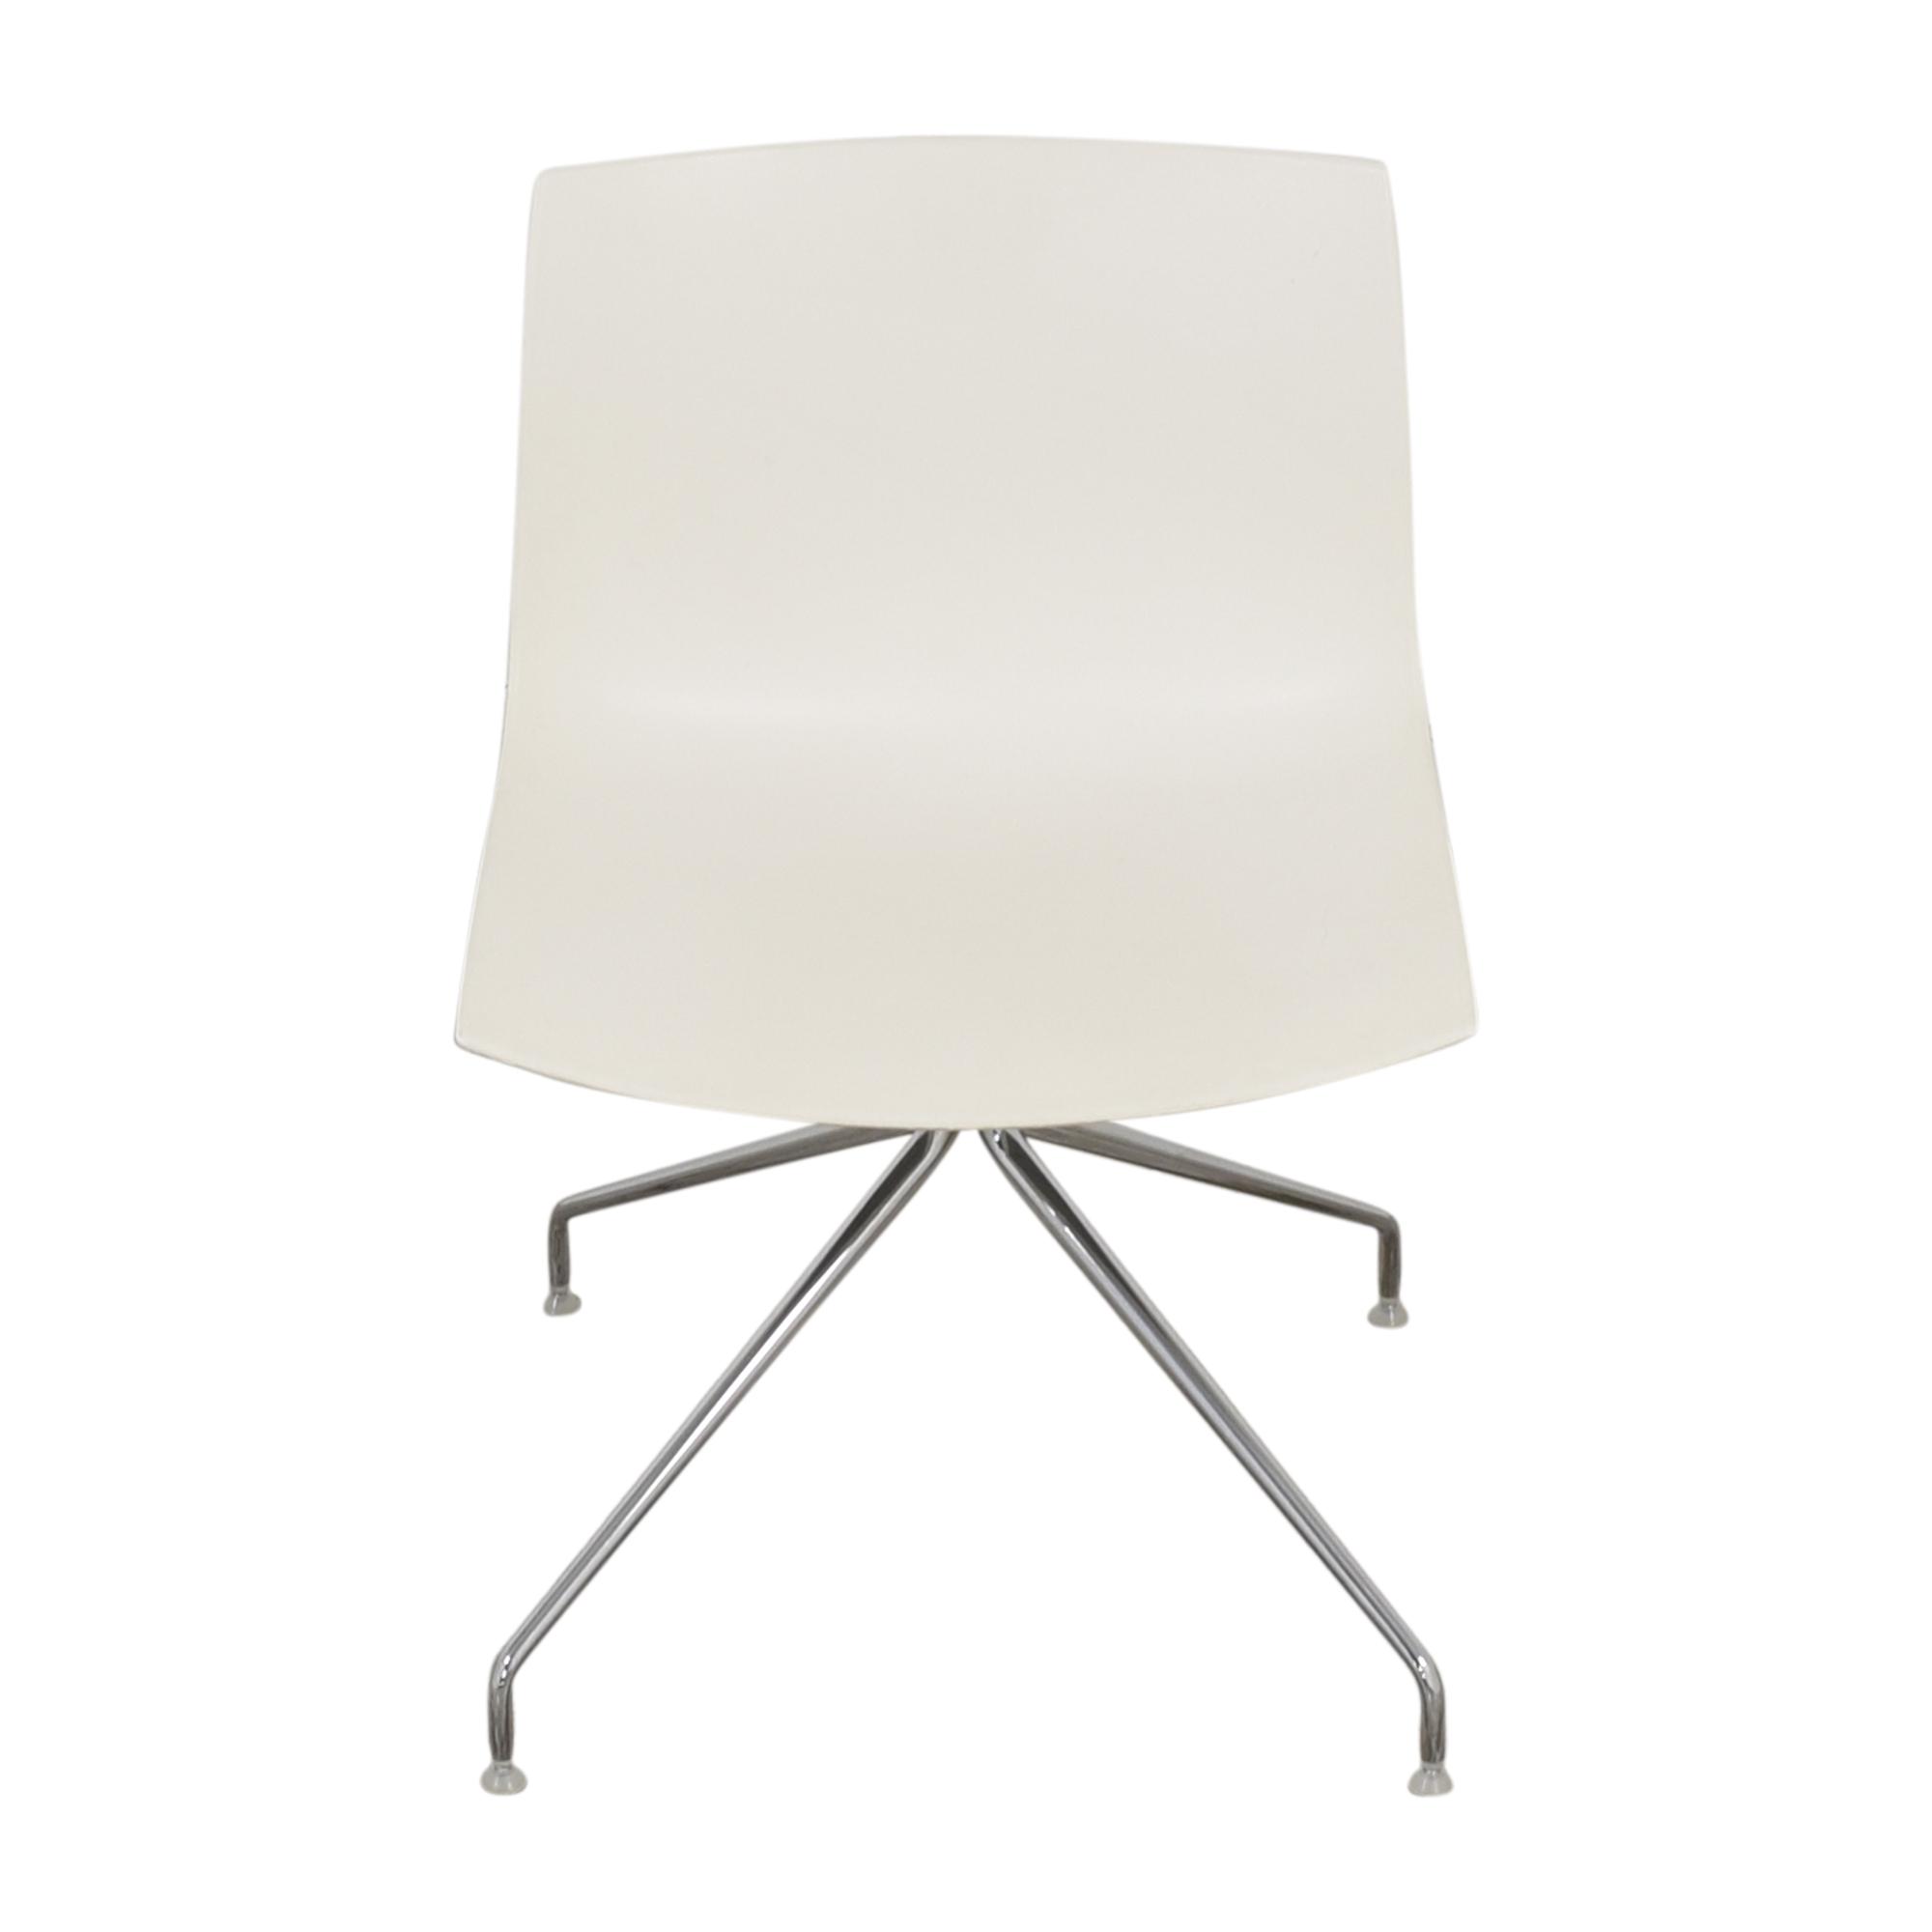 Arper Arper Catifa 46 Trestle Swivel Chair nyc